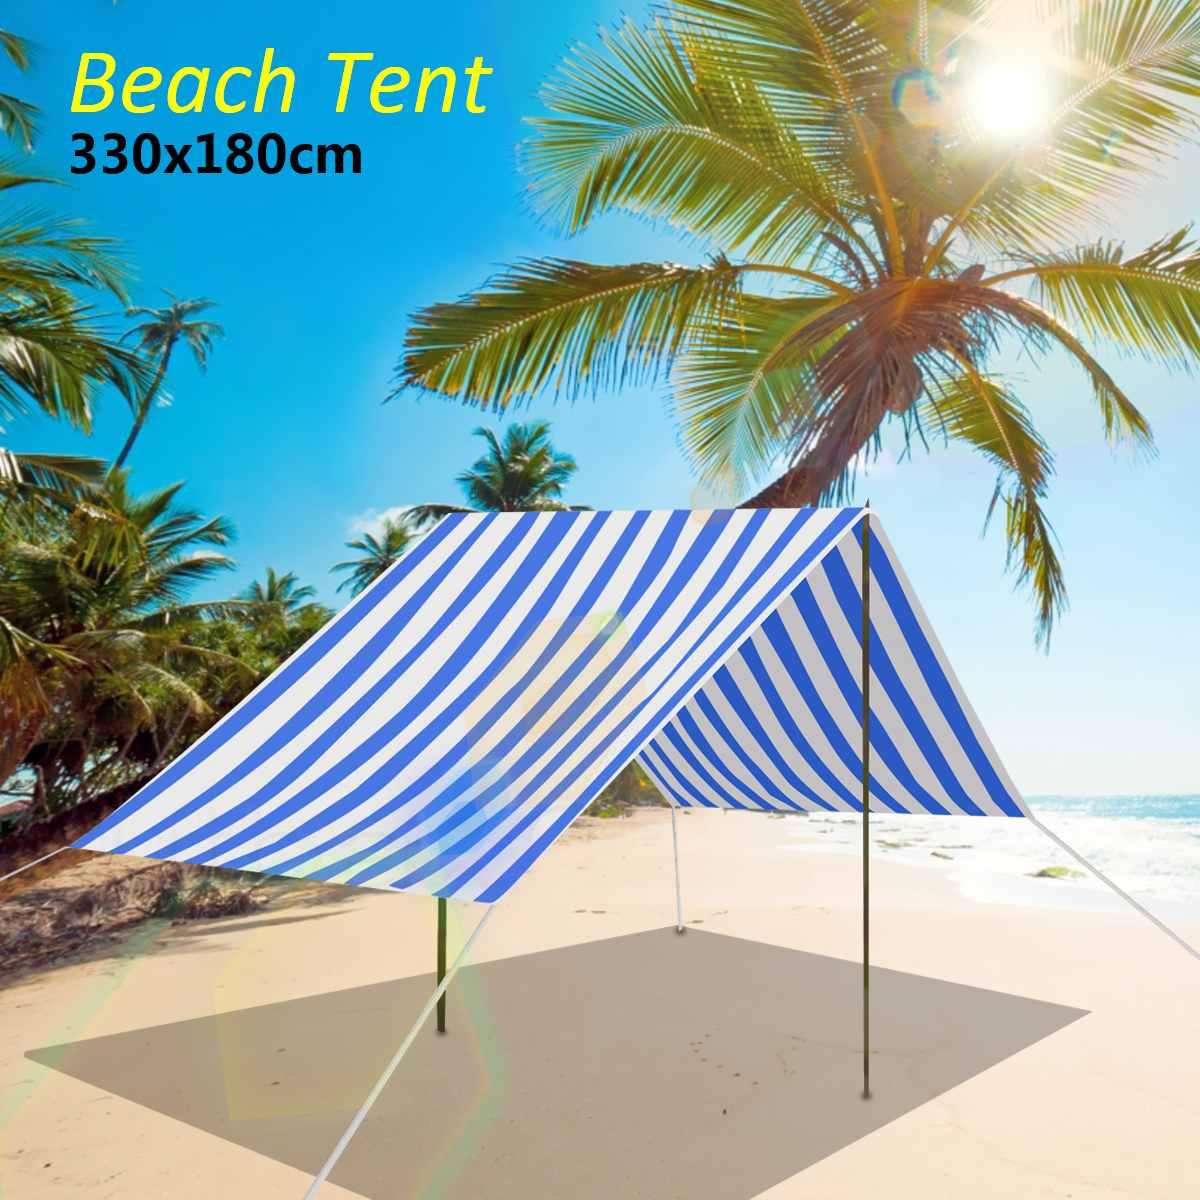 330x180cm Portable Beach Tent UV Sun Shade Shelter Canopy Outdoor Picnic Camping Home Yard Shading Sail Tent For Swim Pool AU/CN330x180cm Portable Beach Tent UV Sun Shade Shelter Canopy Outdoor Picnic Camping Home Yard Shading Sail Tent For Swim Pool AU/CN